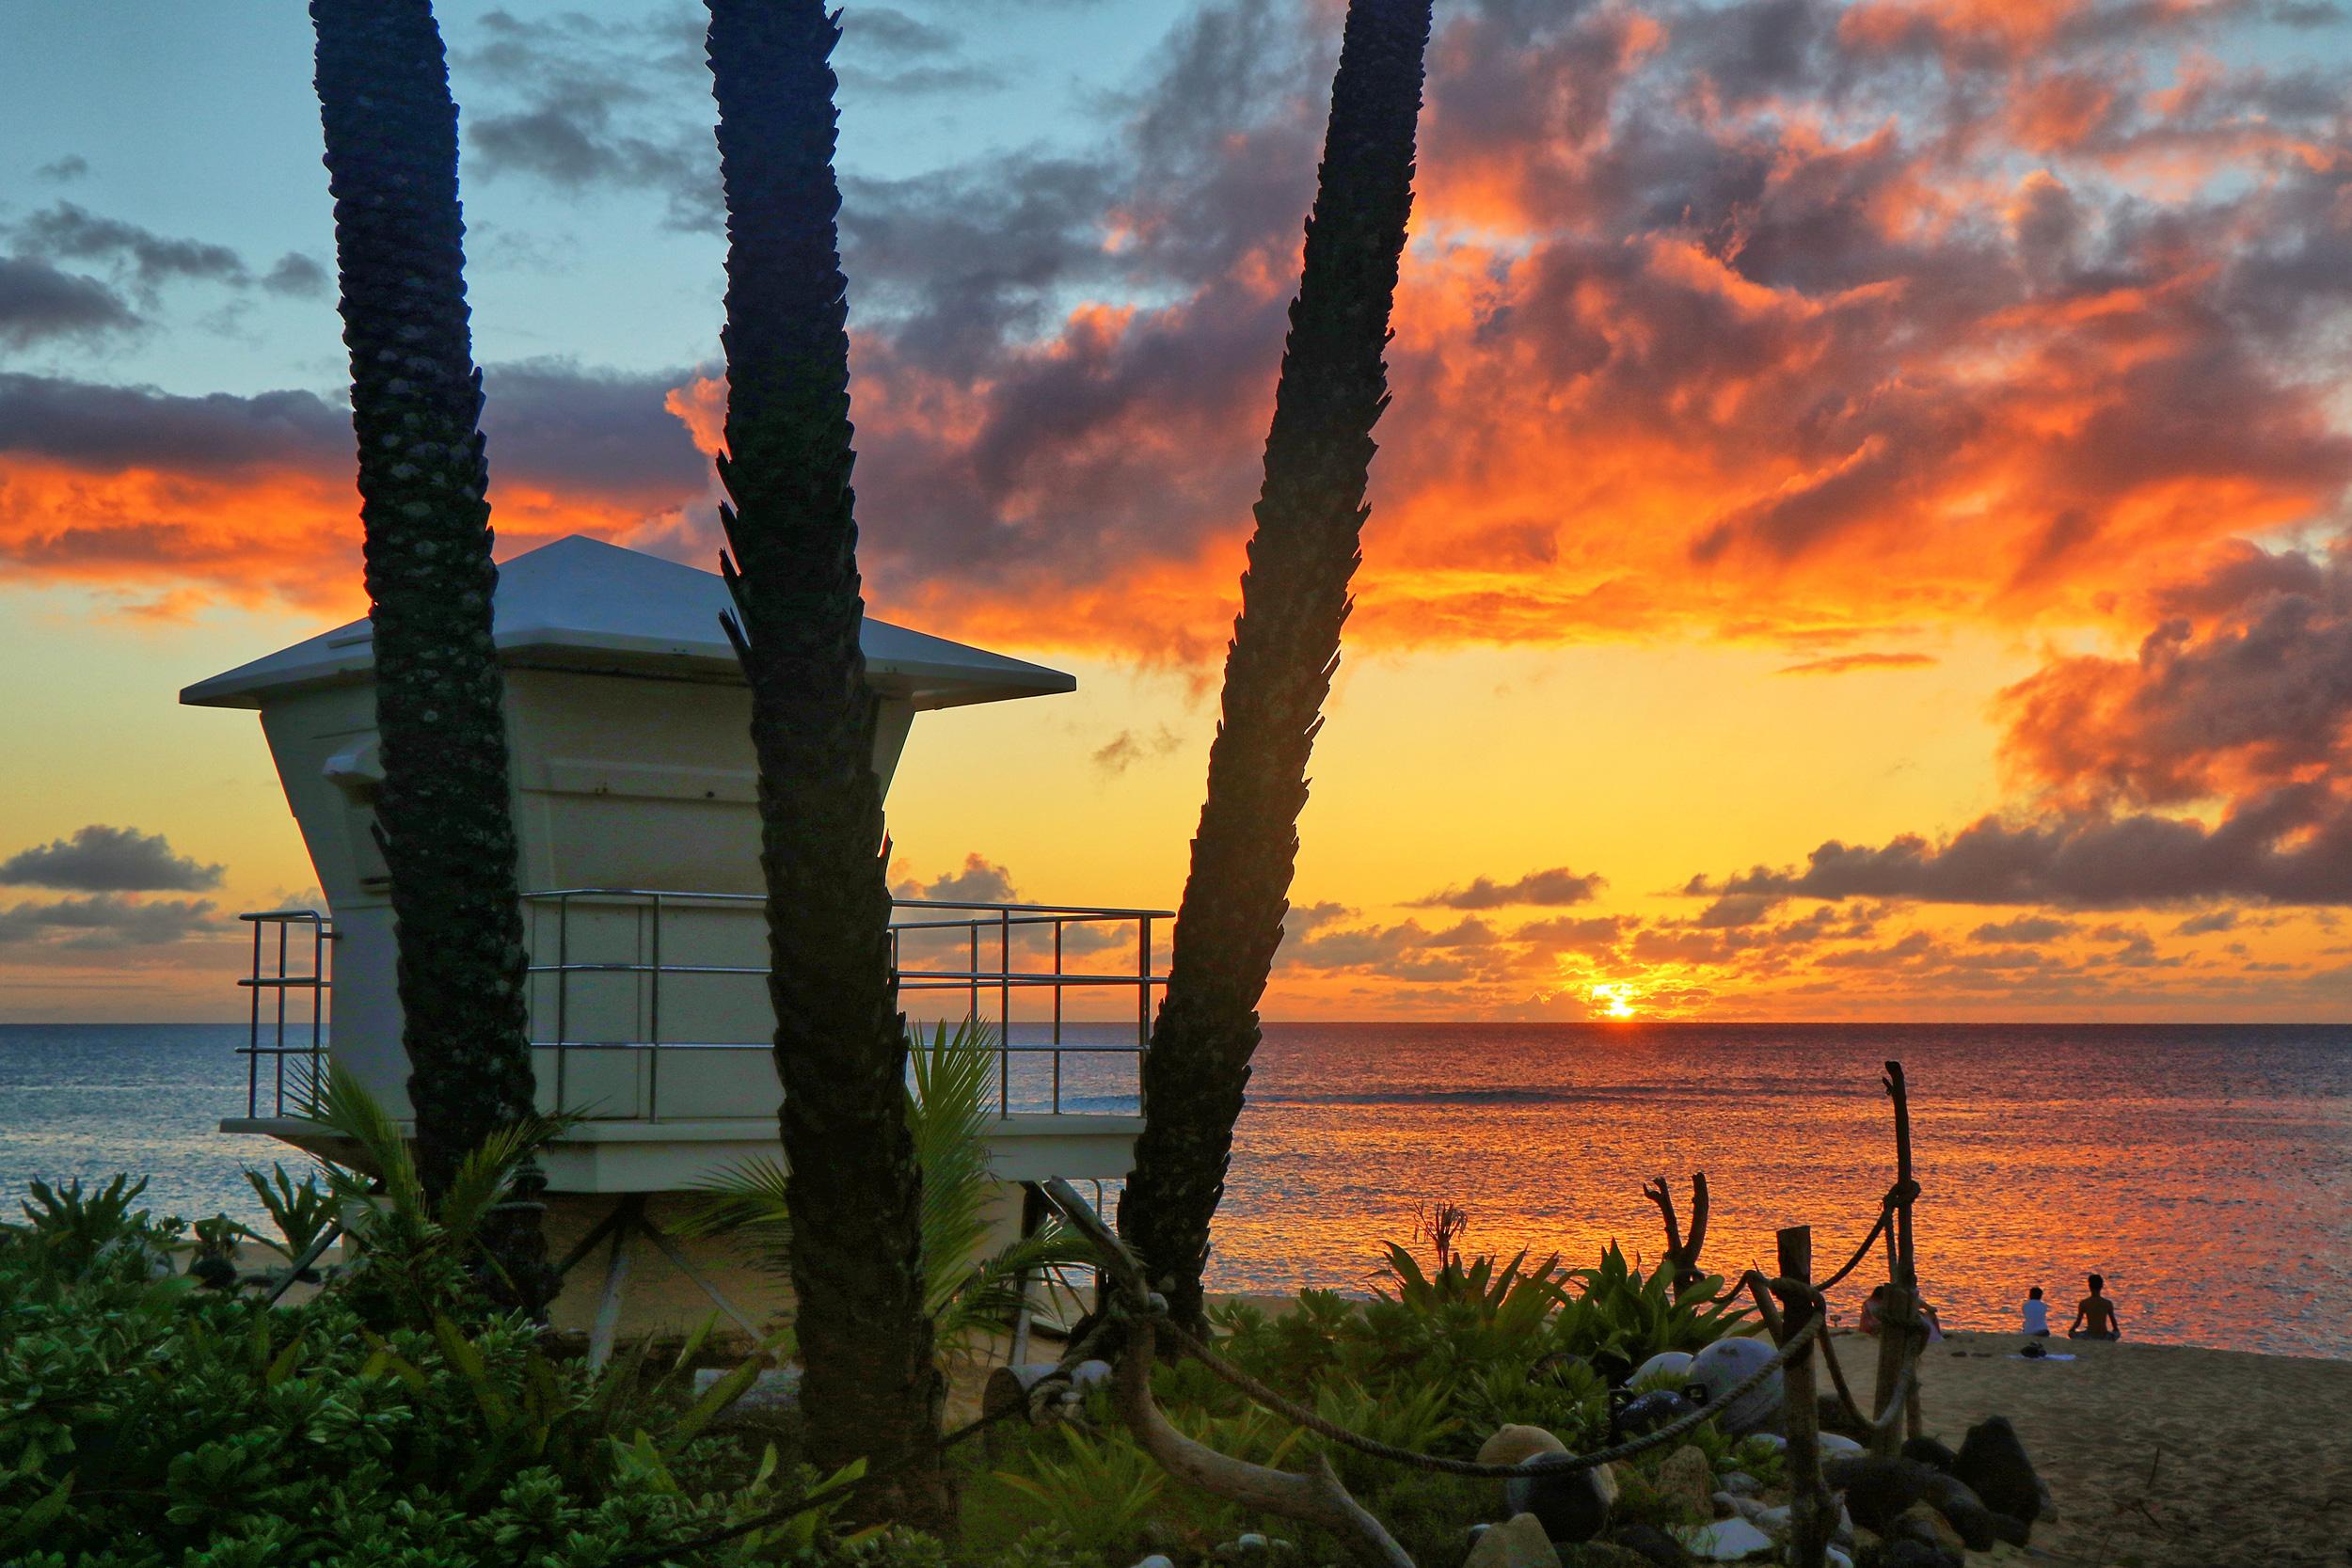 Sunset beach lifeguard stand 1 9610 w